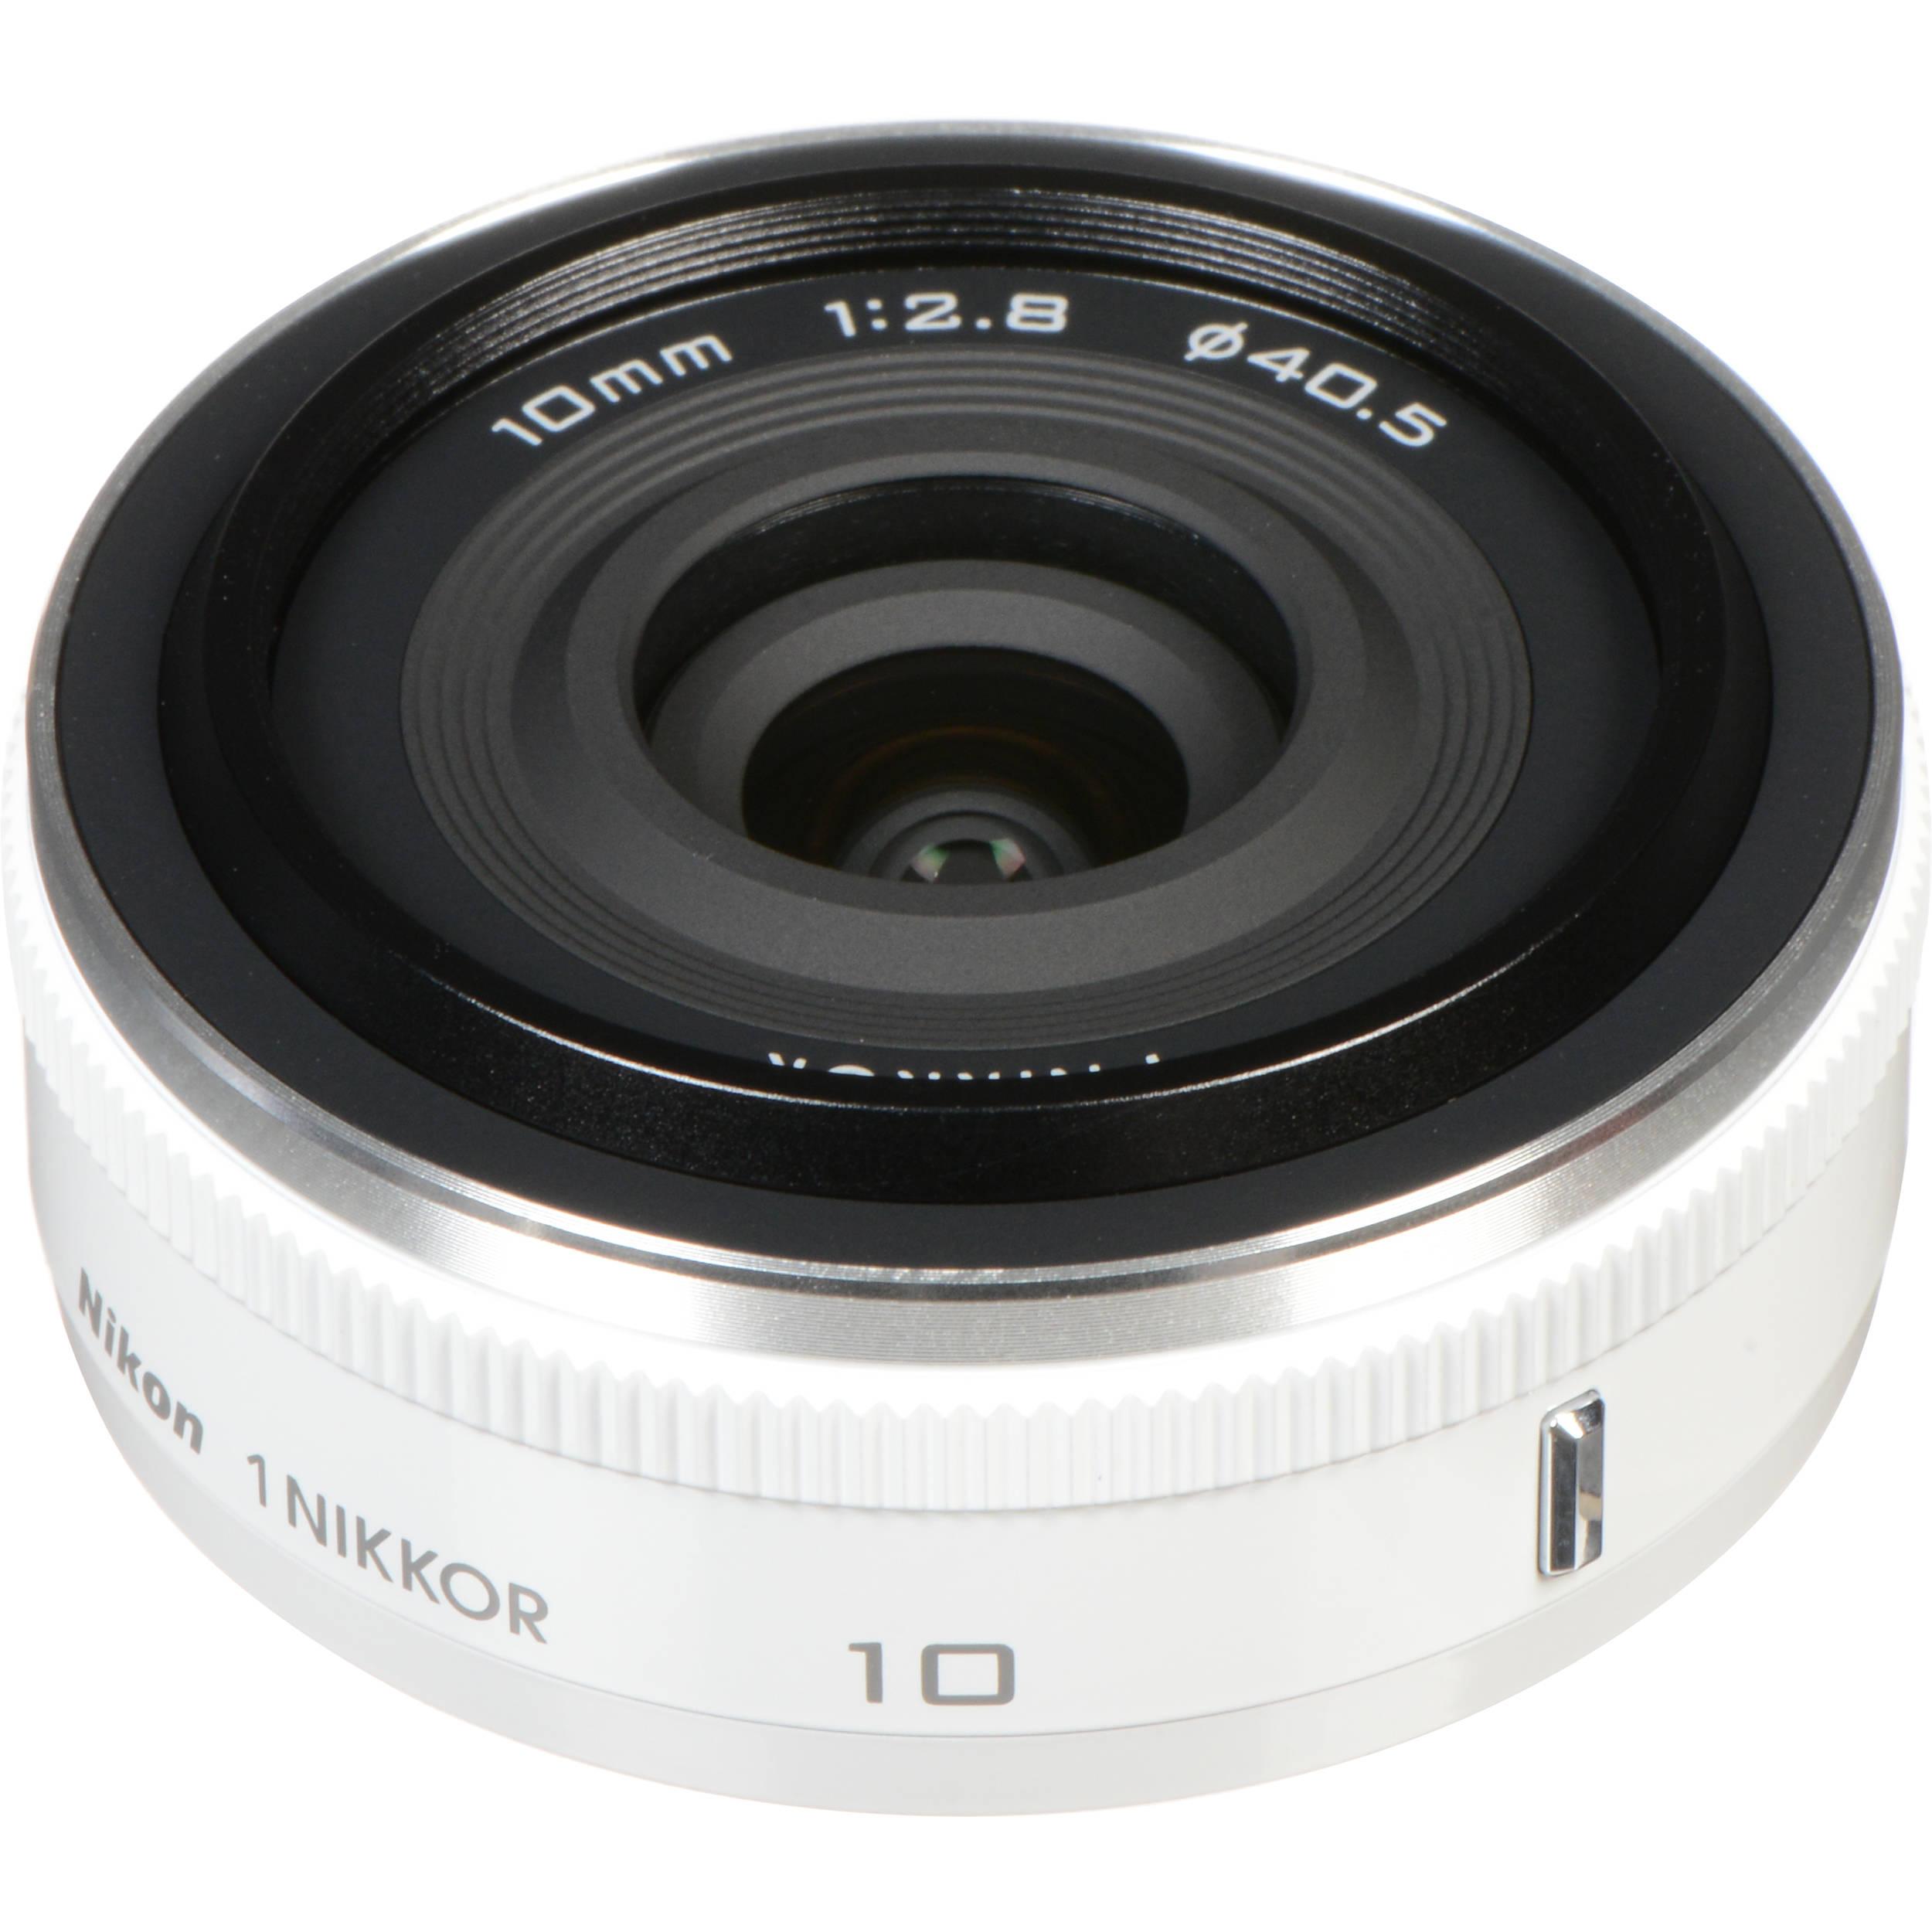 f41ccd9d06c Used Nikon 1 NIKKOR 10mm f/2.8 Lens (White) 3320B B&H Photo Video